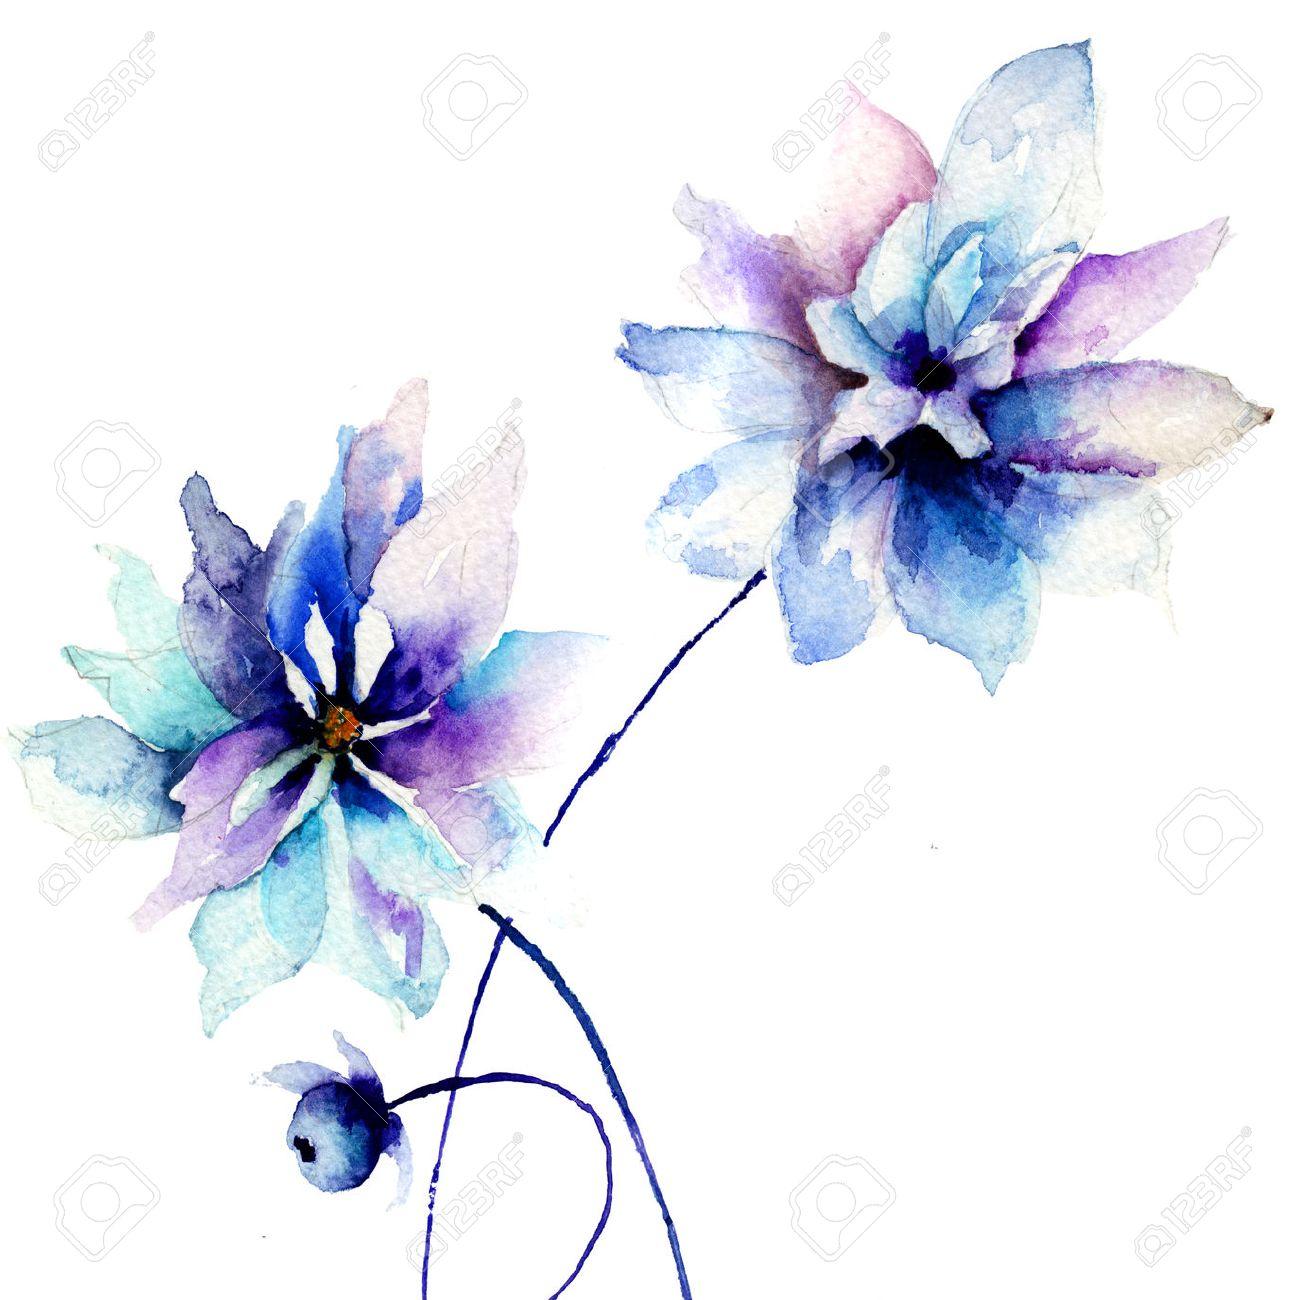 Beautiful blue flowers watercolor painting stock photo picture and beautiful blue flowers watercolor painting stock photo 22967265 izmirmasajfo